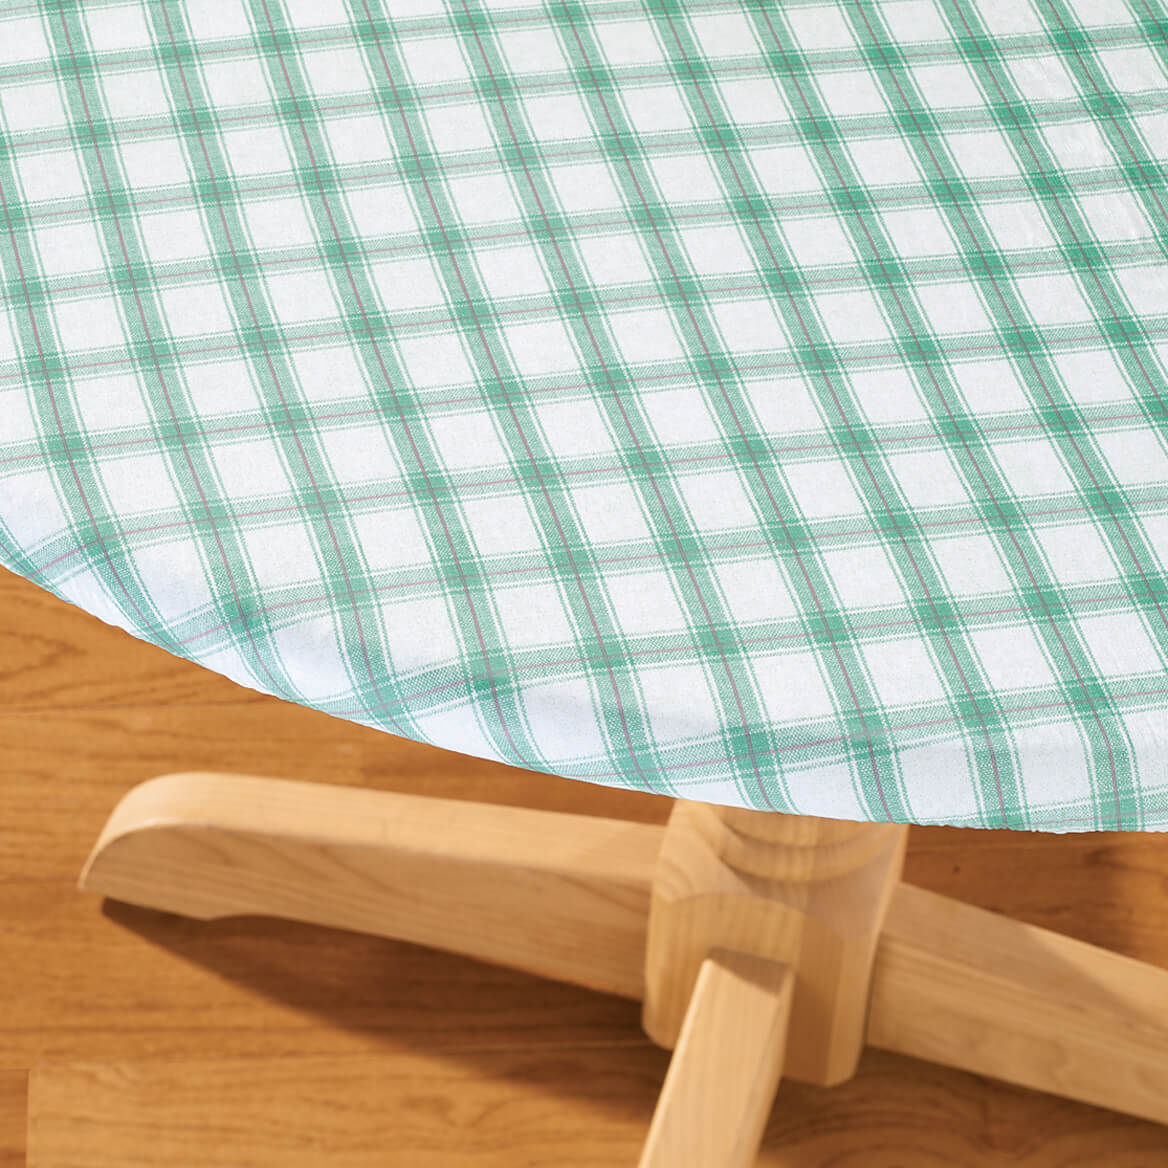 plaid elasticized vinyl table cover